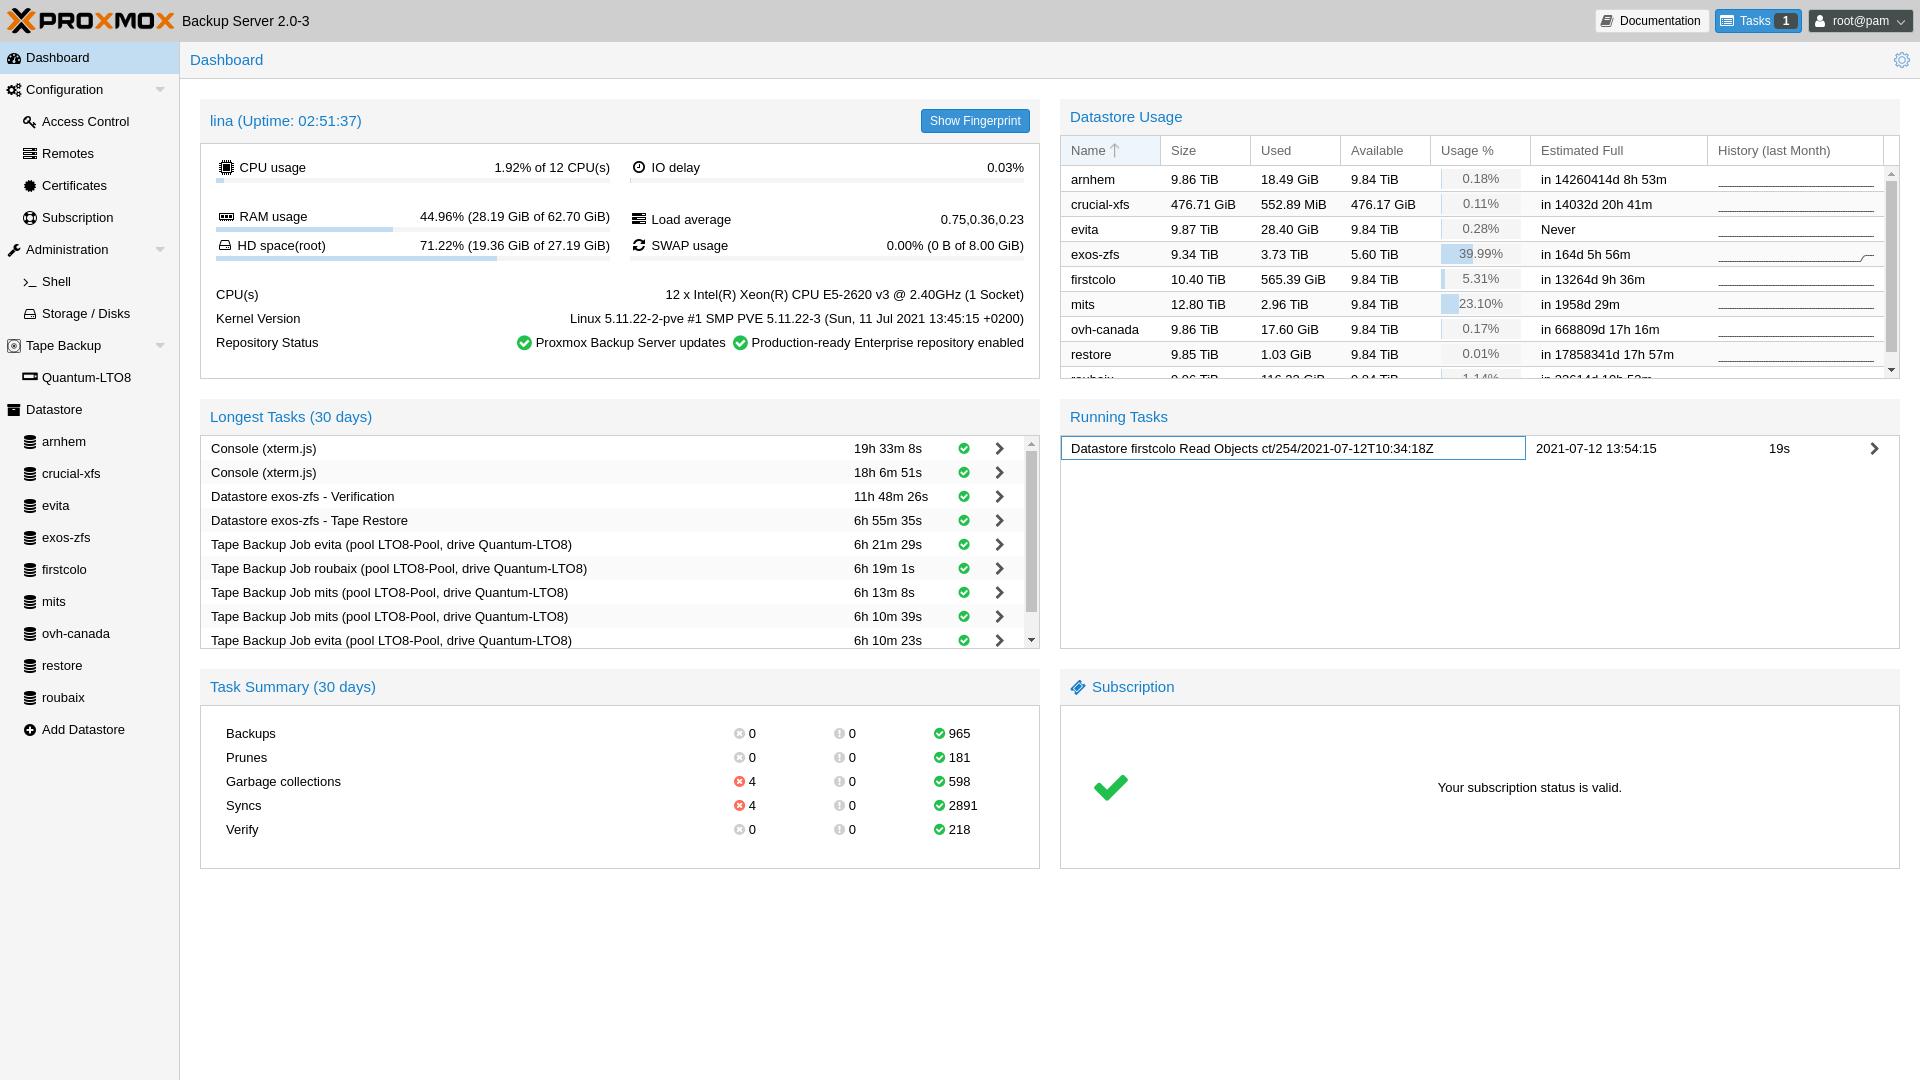 Zdroj: https://pbs.proxmox.com/wiki/index.php/Main_Page#/media/File:Proxmox-Backup-Server-Dashboard.png